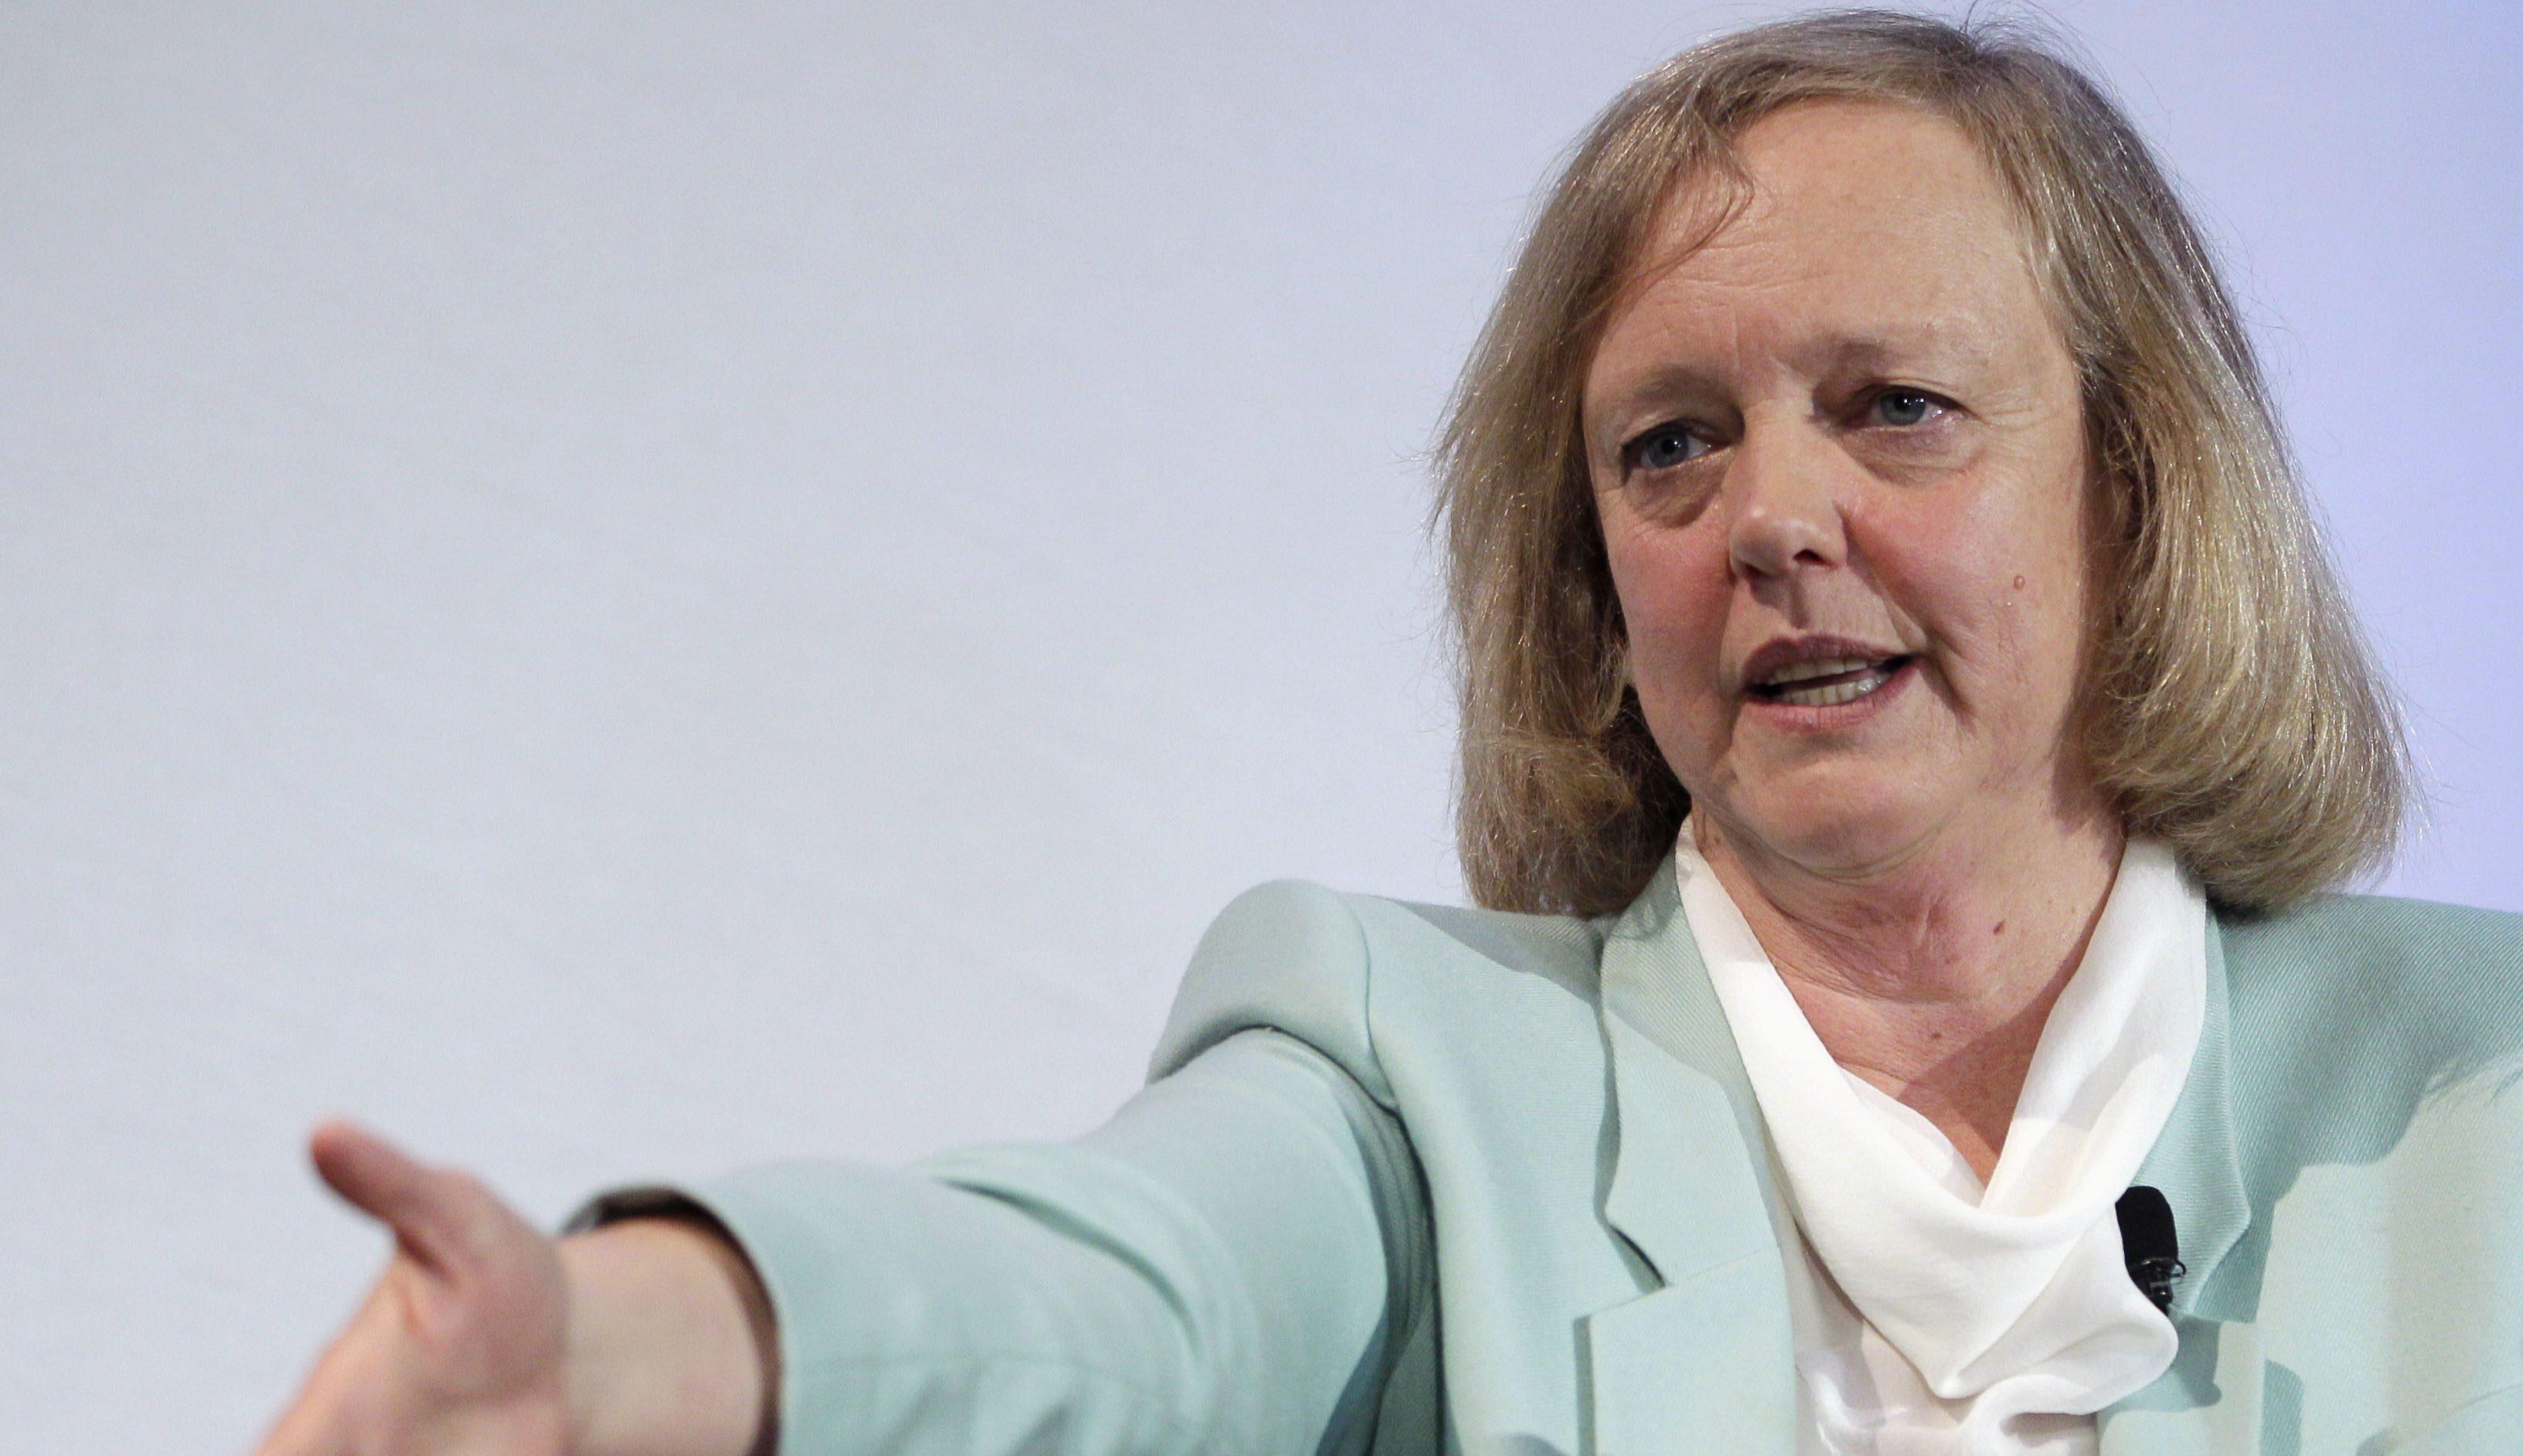 Meg Uber needs Meg Whitman as CEO